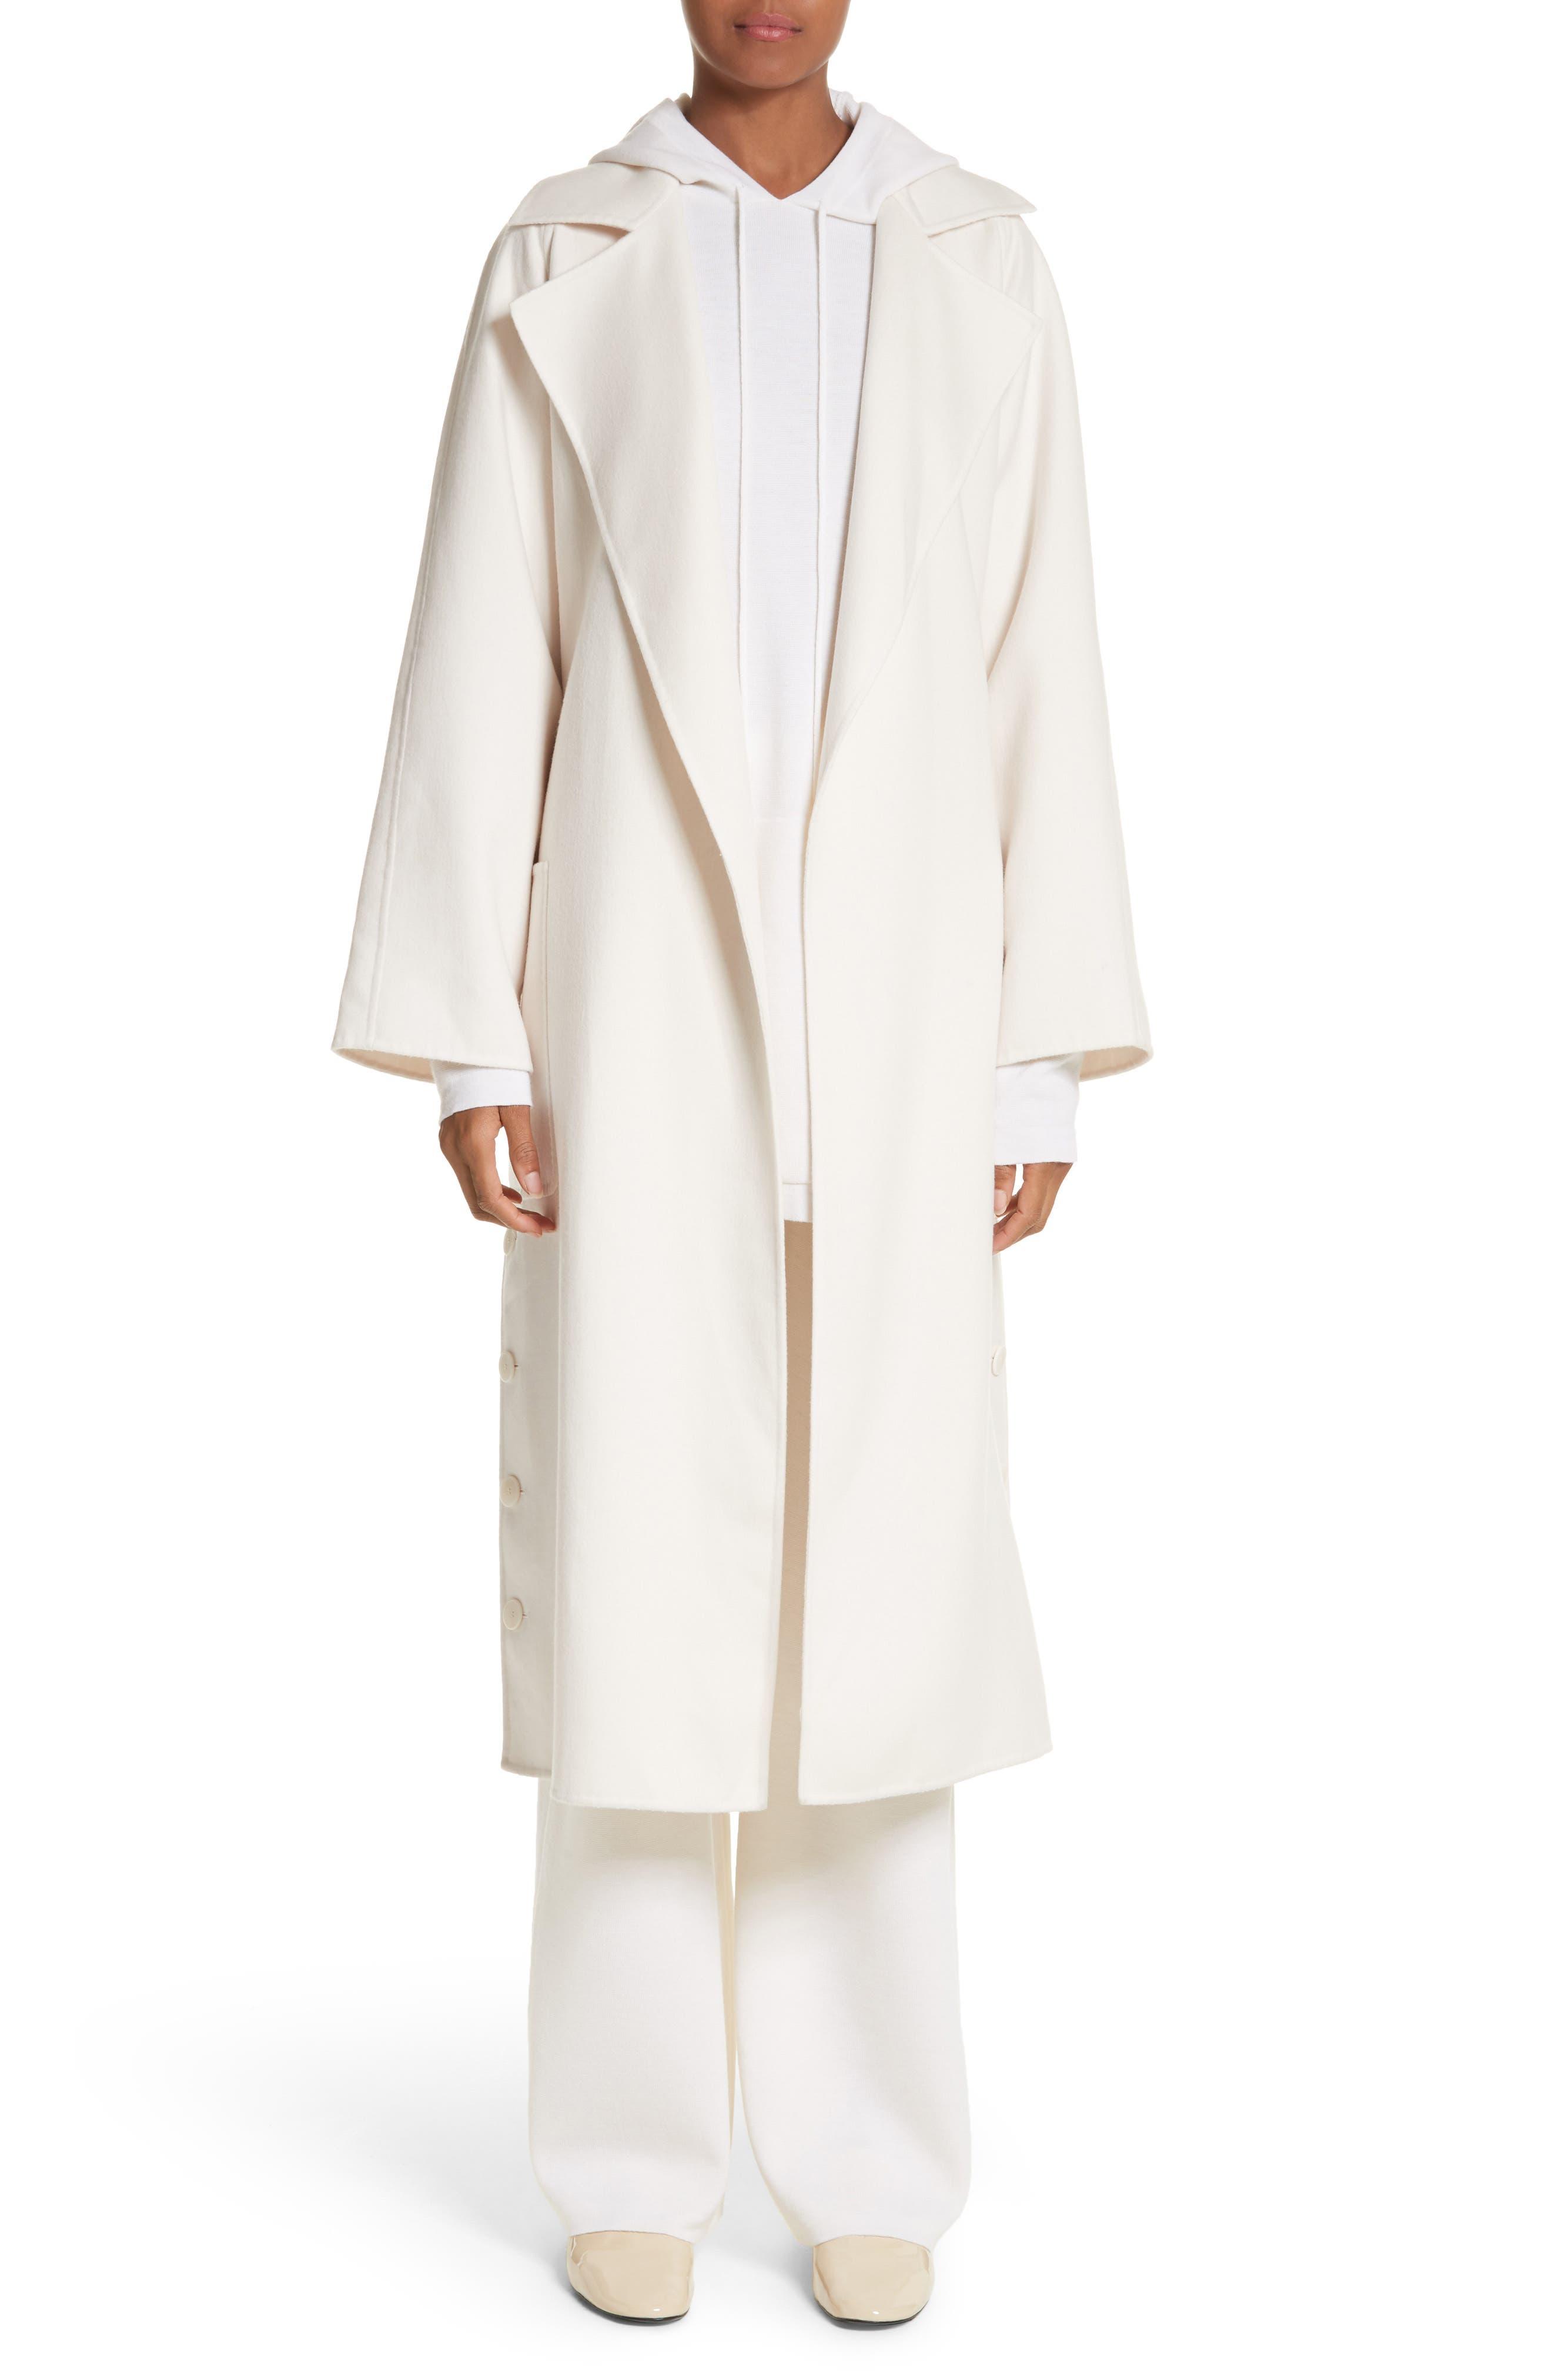 Alacre Wool & Cashmere Coat,                             Main thumbnail 1, color,                             110